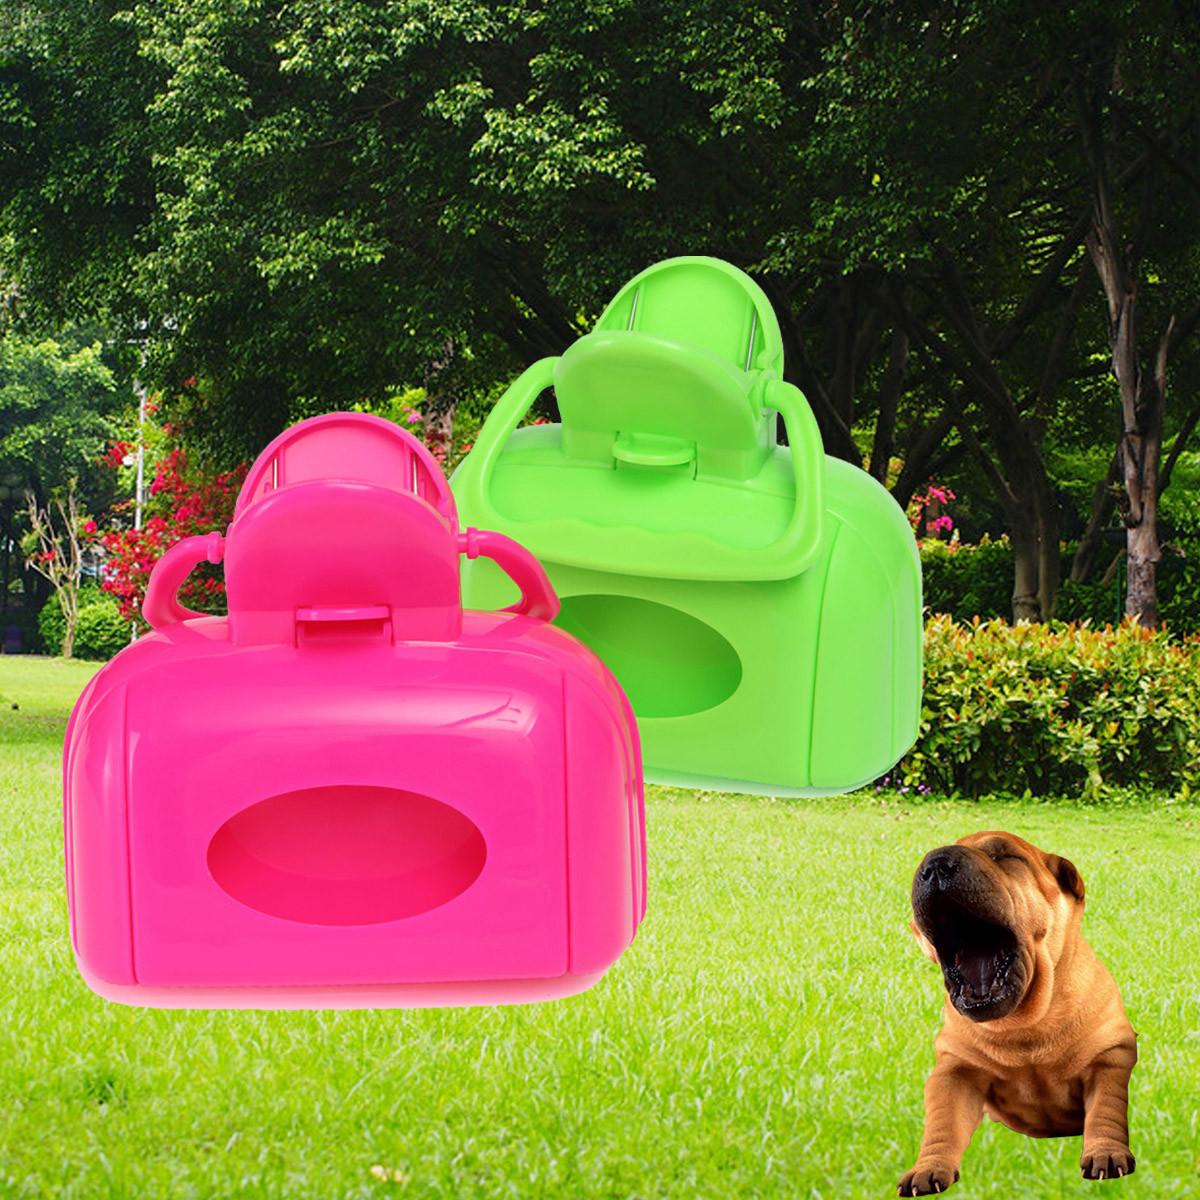 Portable Pet Dog Cat Waste Bag Case Pooper Scooper Poop Scoop Pickup Clip Easy Clean Tool